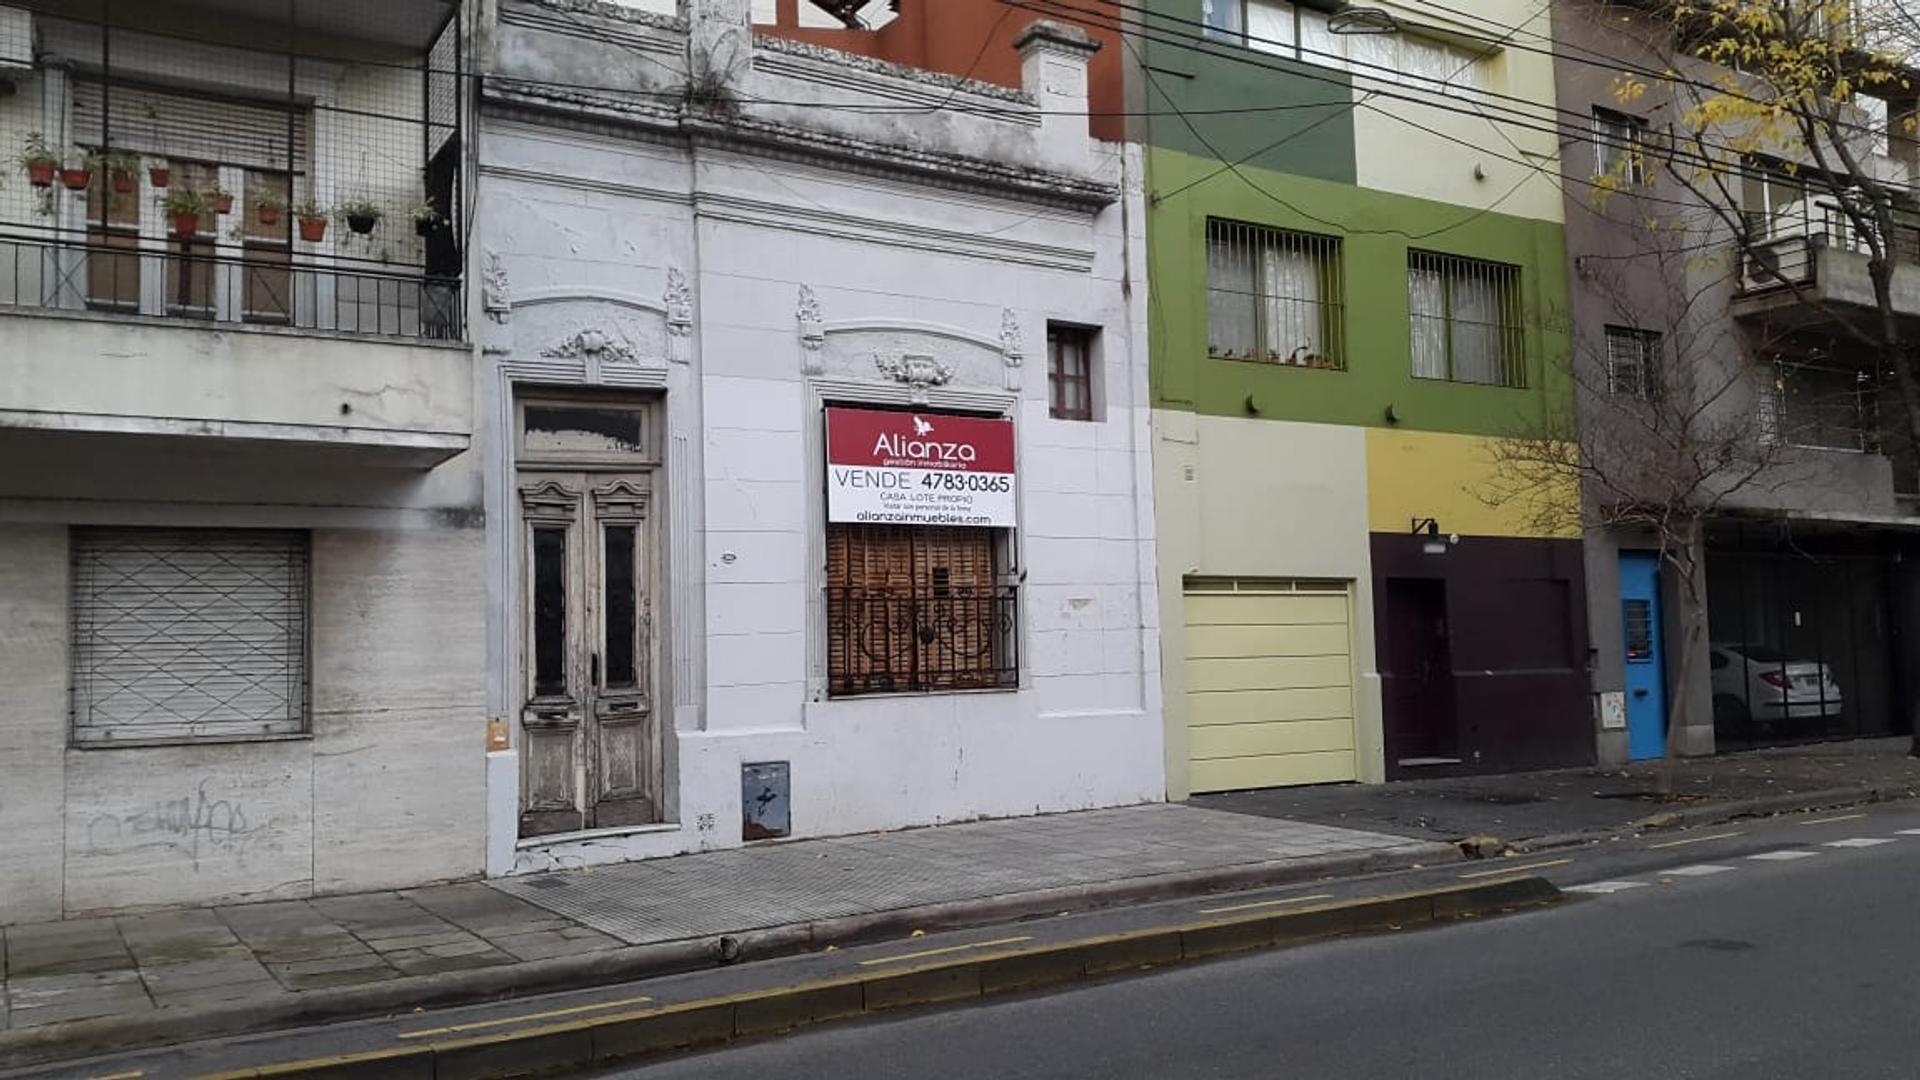 CASA CON LOTE PROPIO - MÚLTIPLES DESTINOS